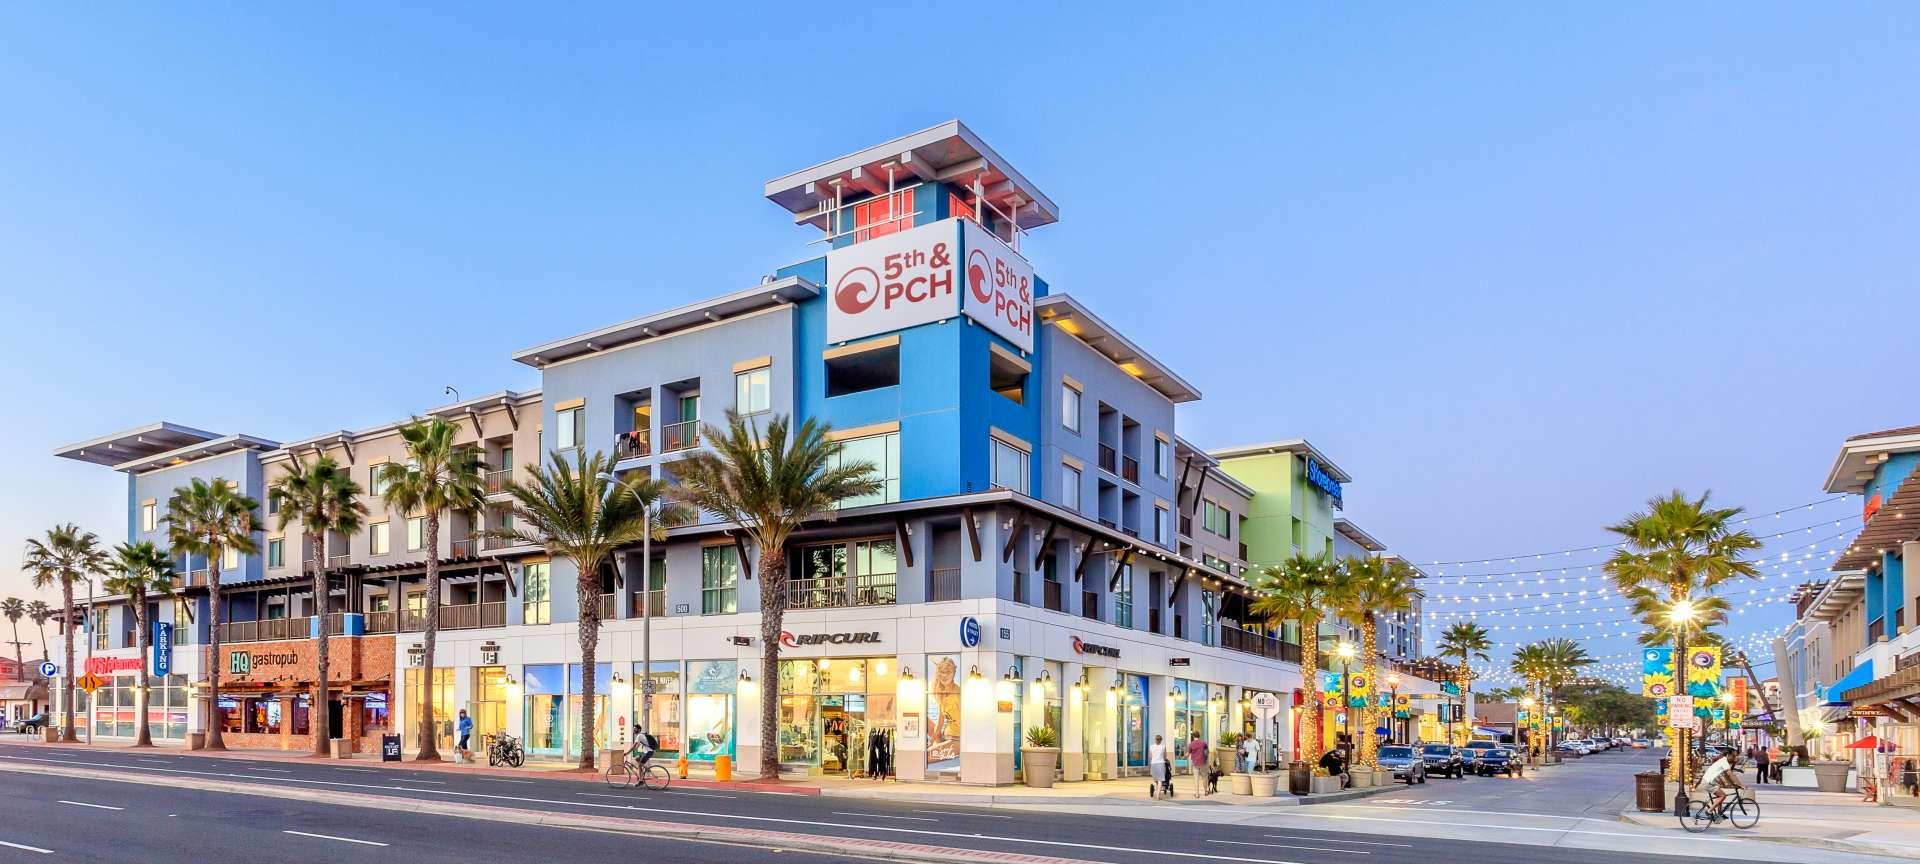 Huntington Beach Ping Centers 5th